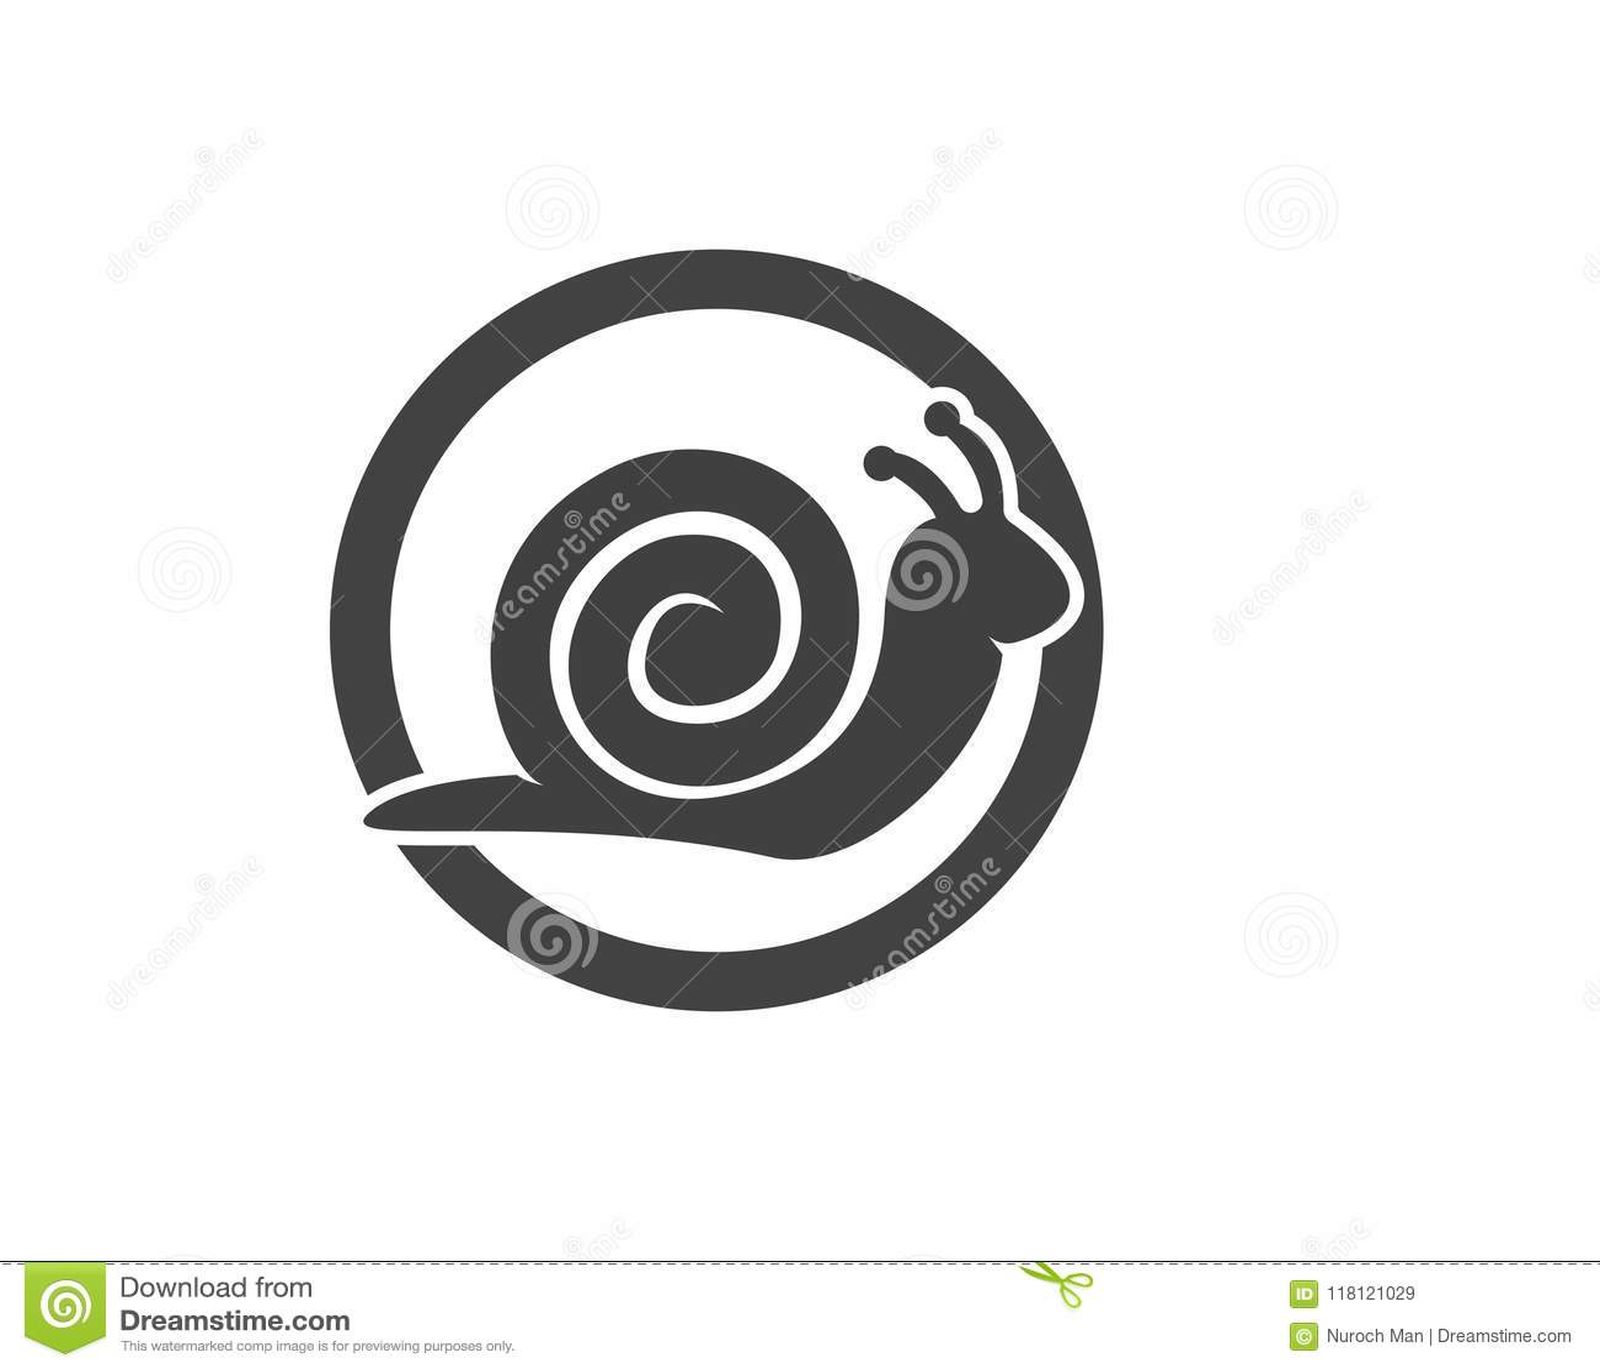 snail in logo template stock vector illustration of design 118121029